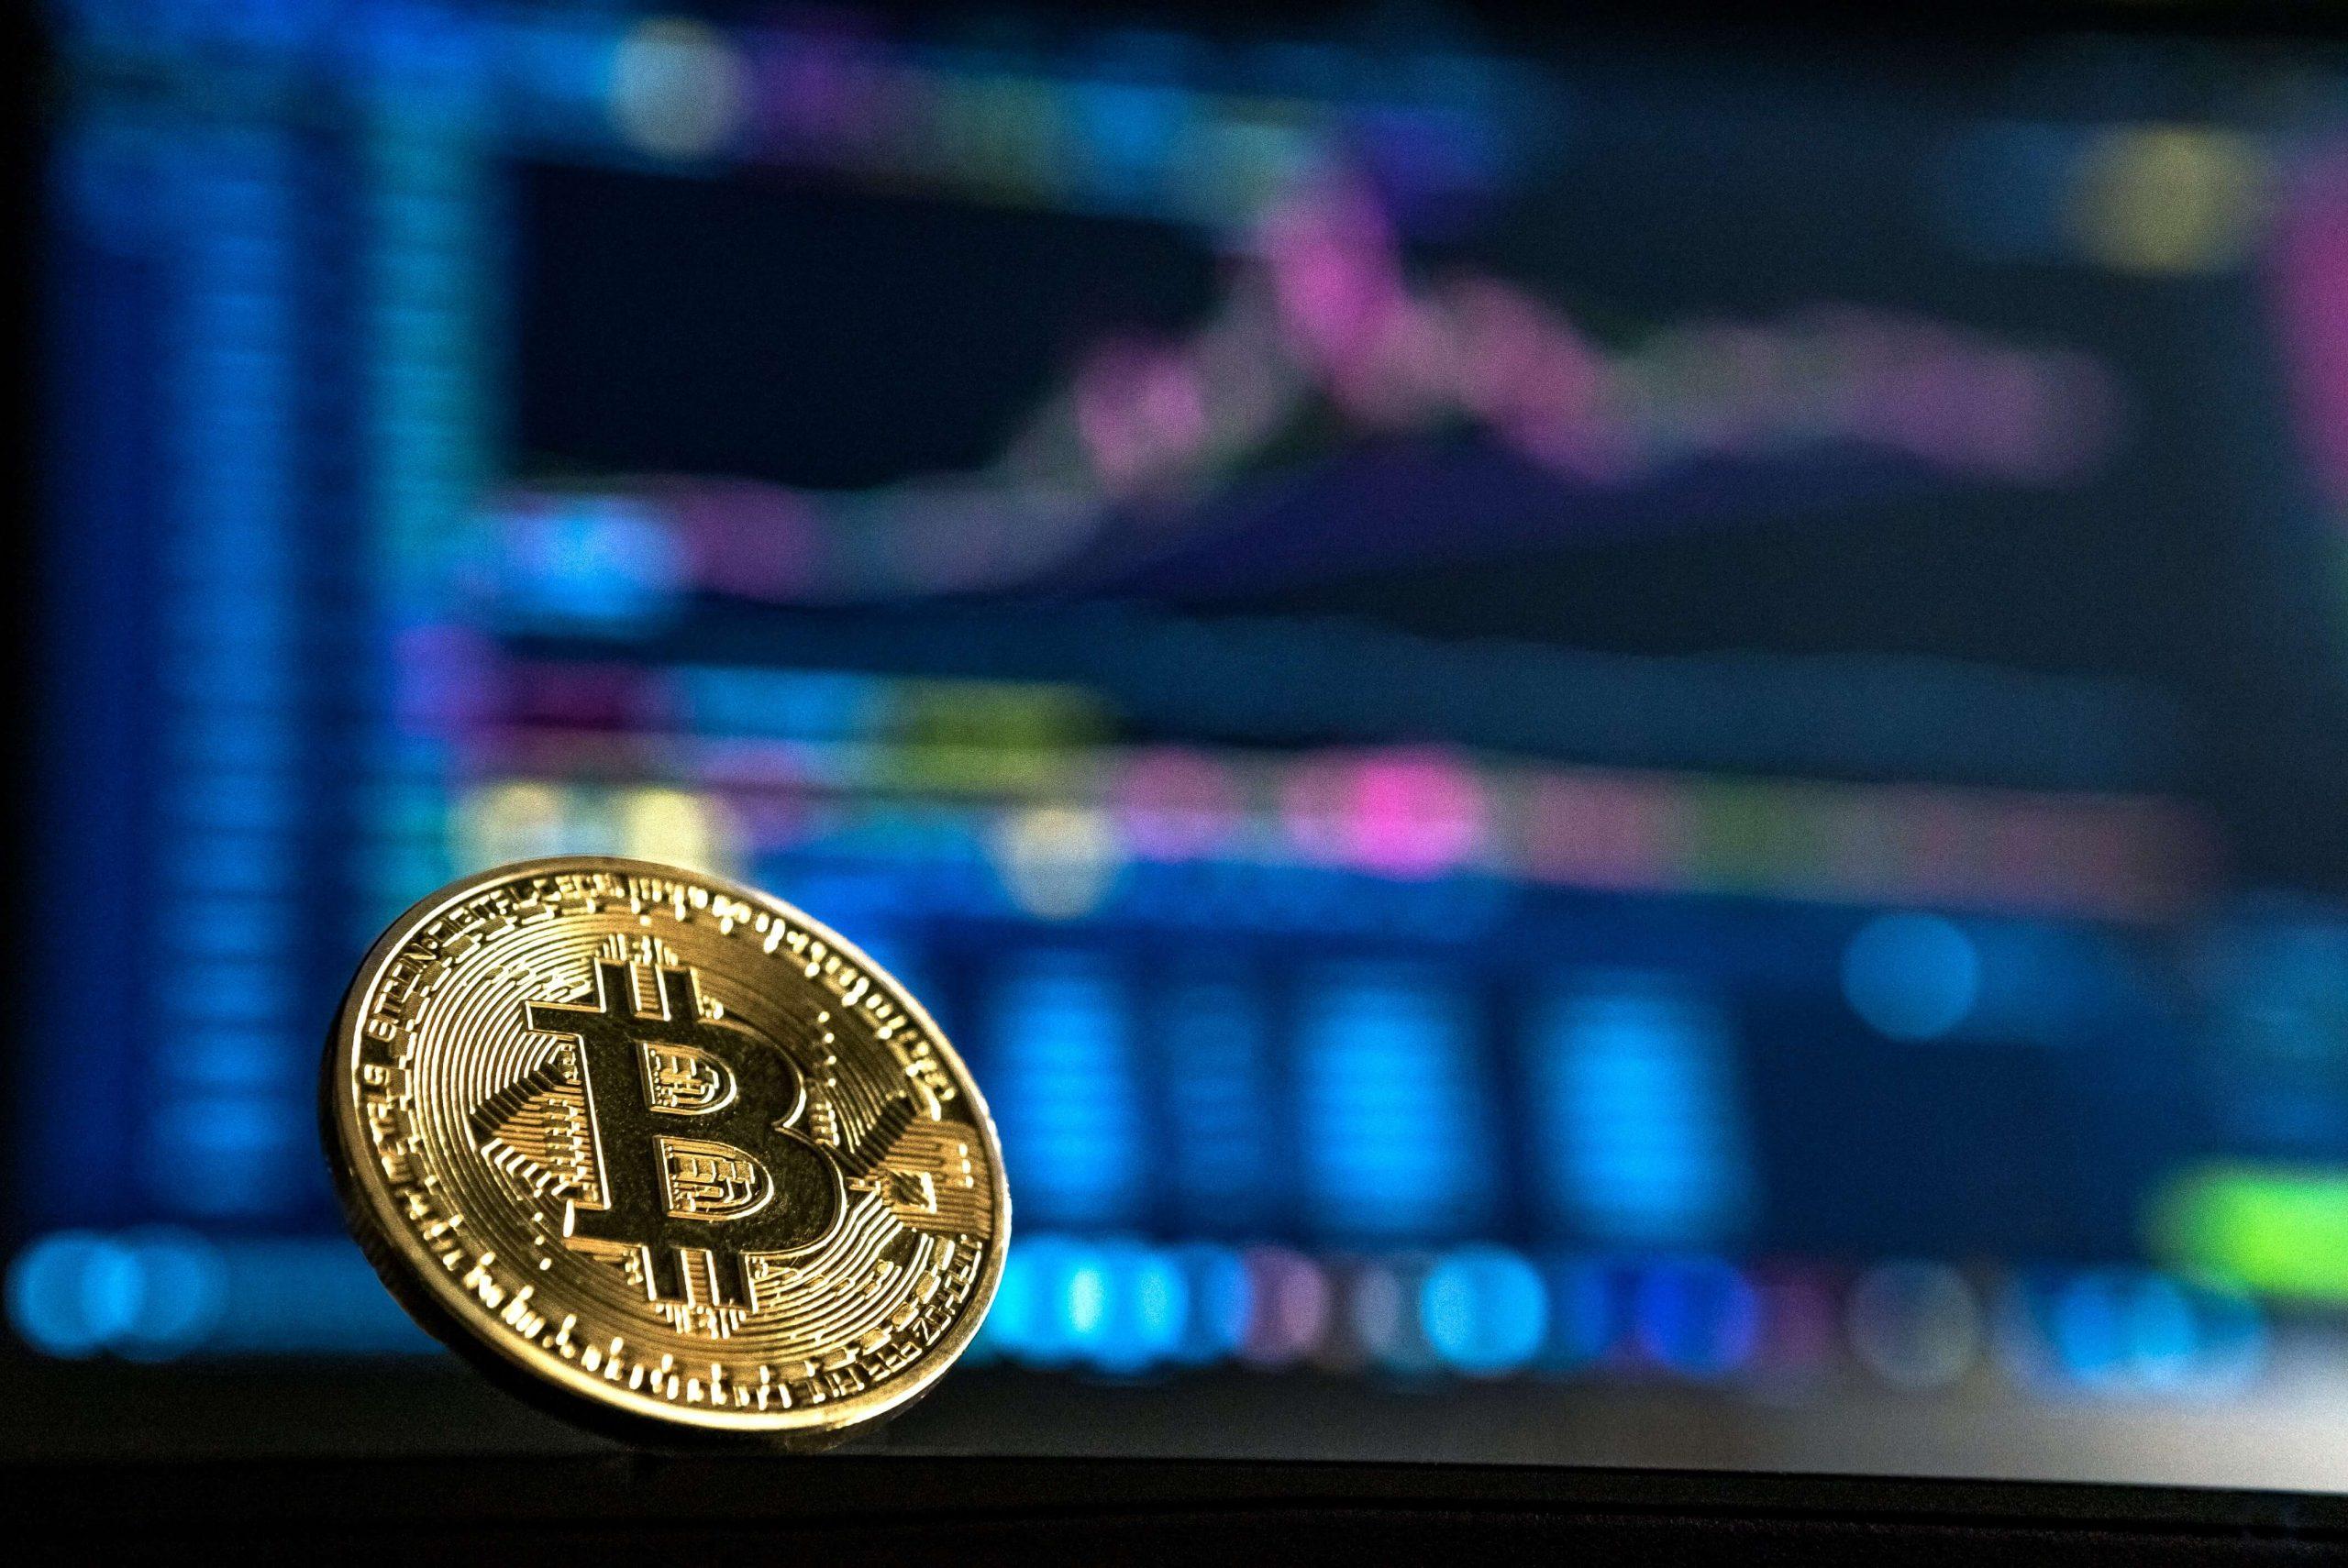 FIFO Bitcoin Essentials 101